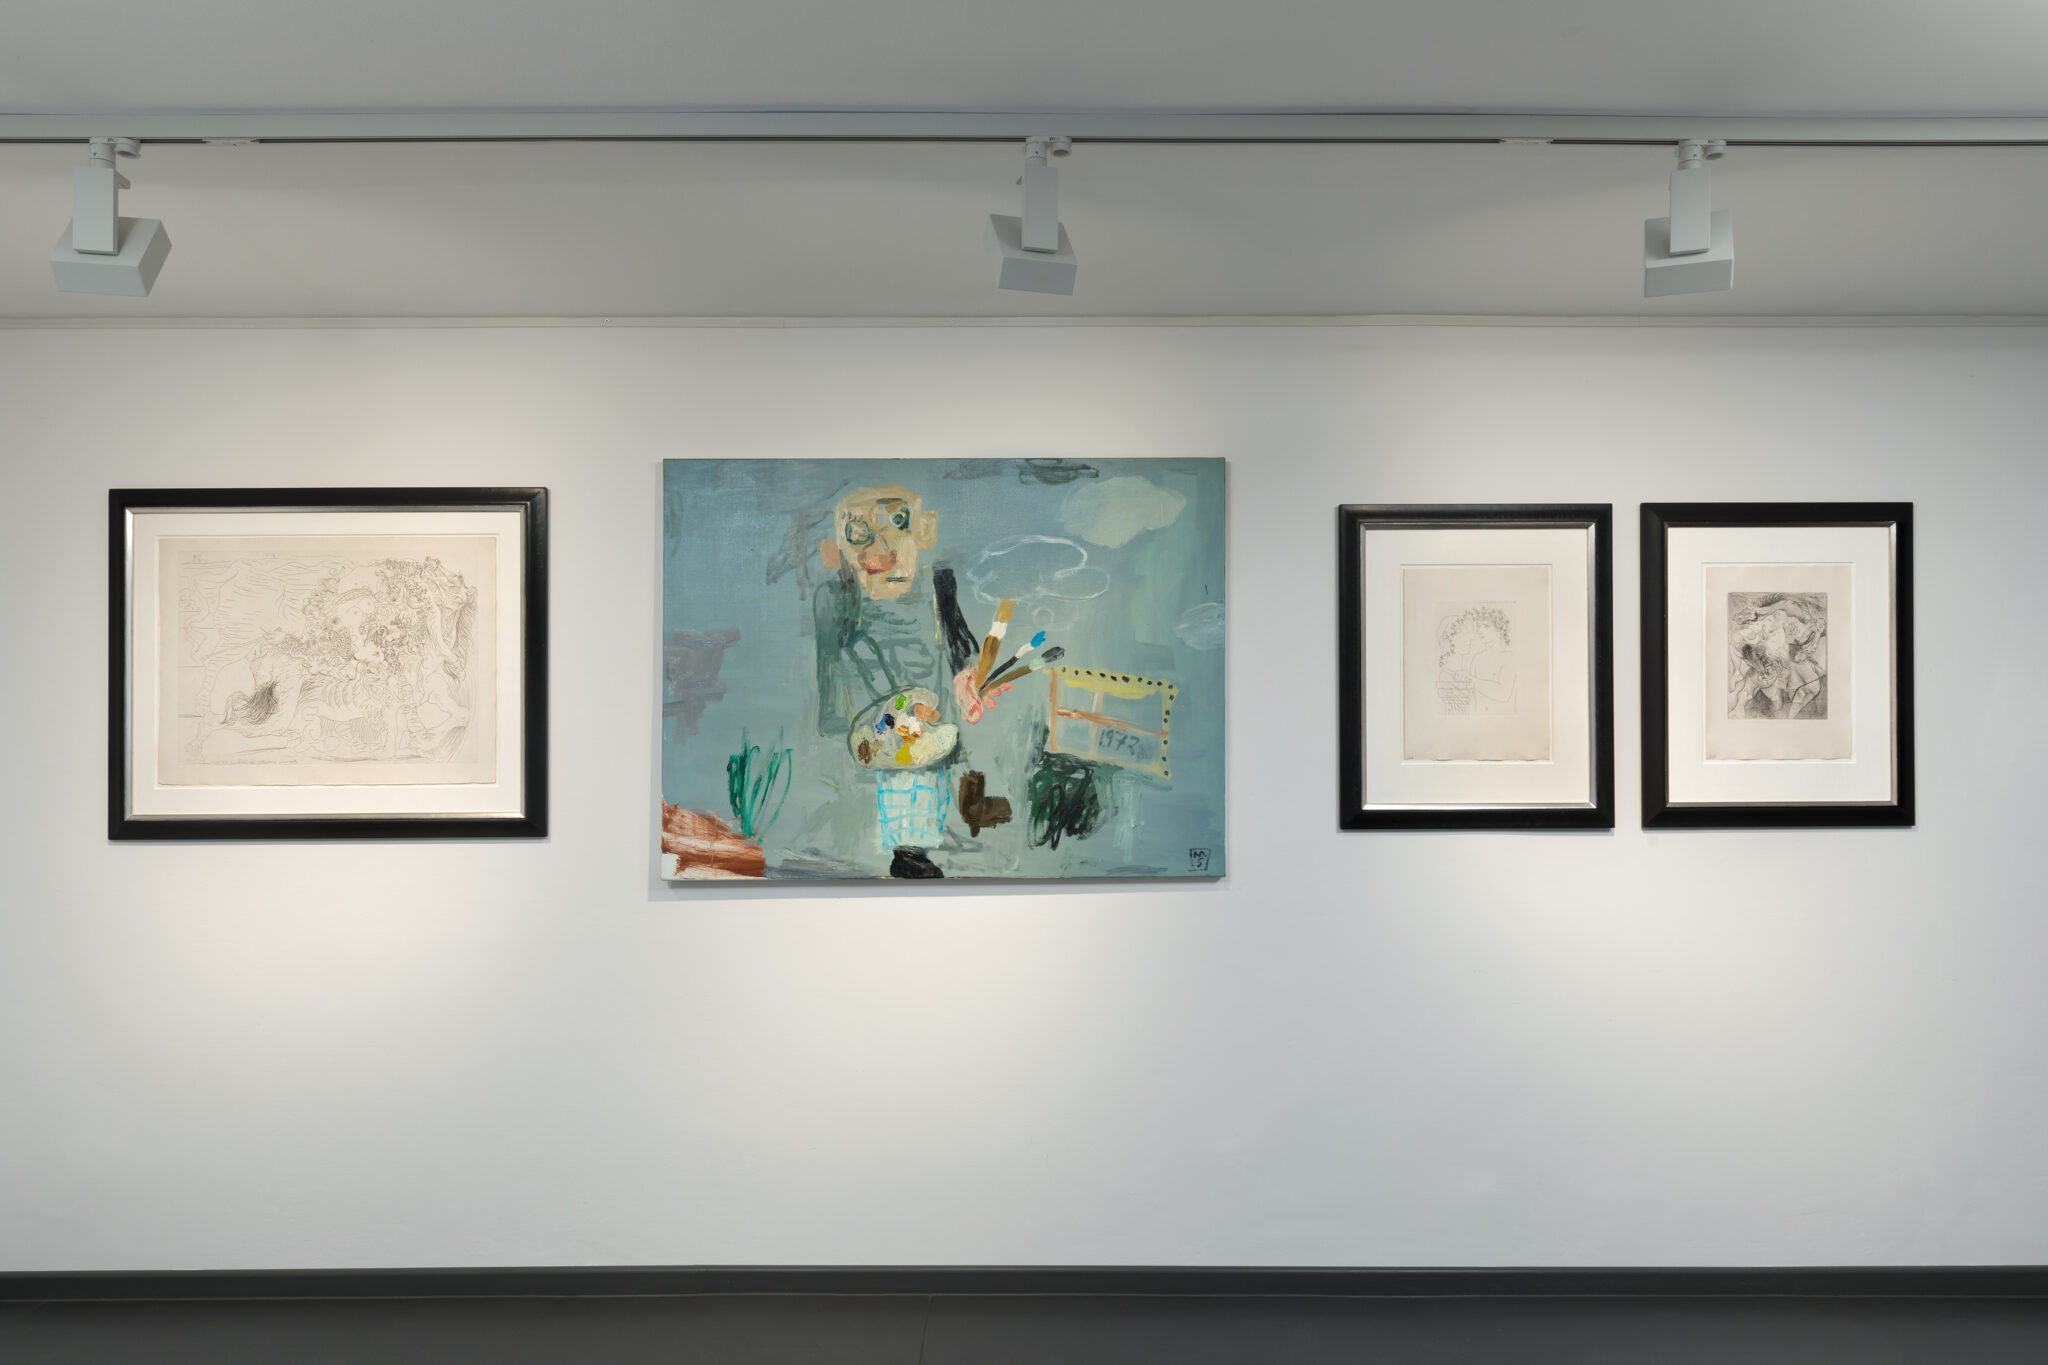 Matias Sanchez and Picasso prints at Artcurial Germany